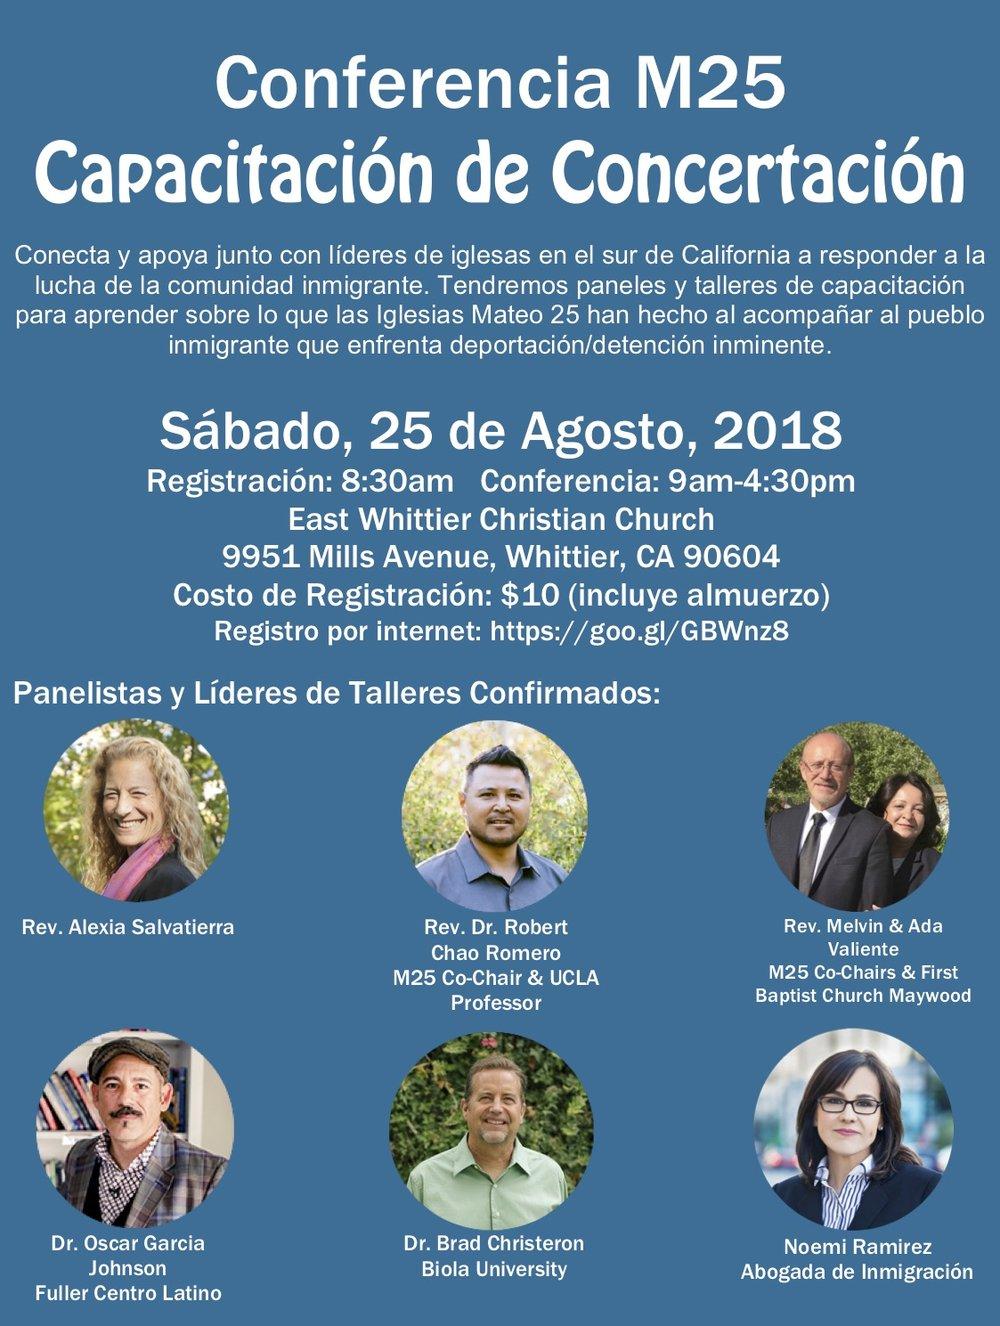 M25 Conference 2018 flyer spa.jpg